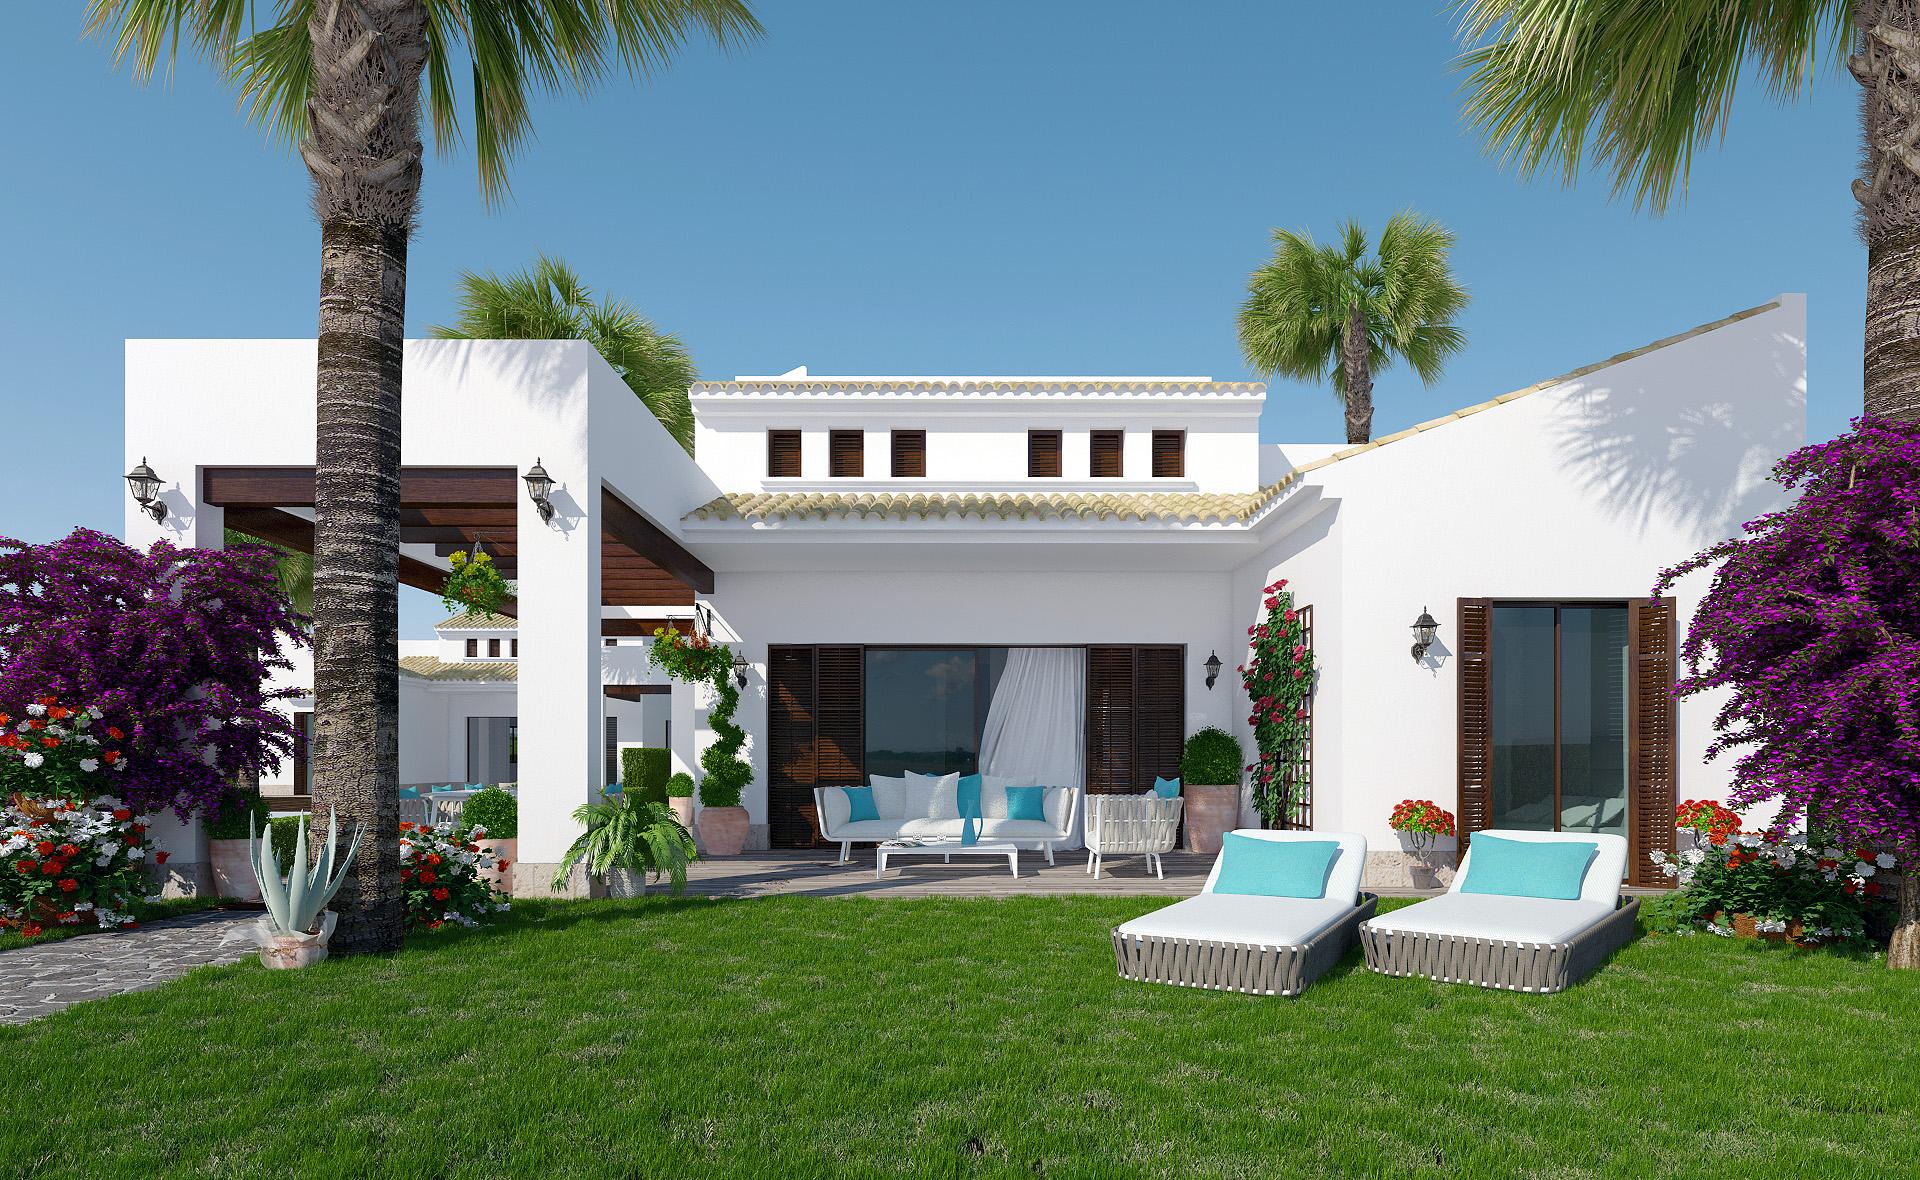 Villa style hacienda moderne immo espagne for Decoration espagnole maison